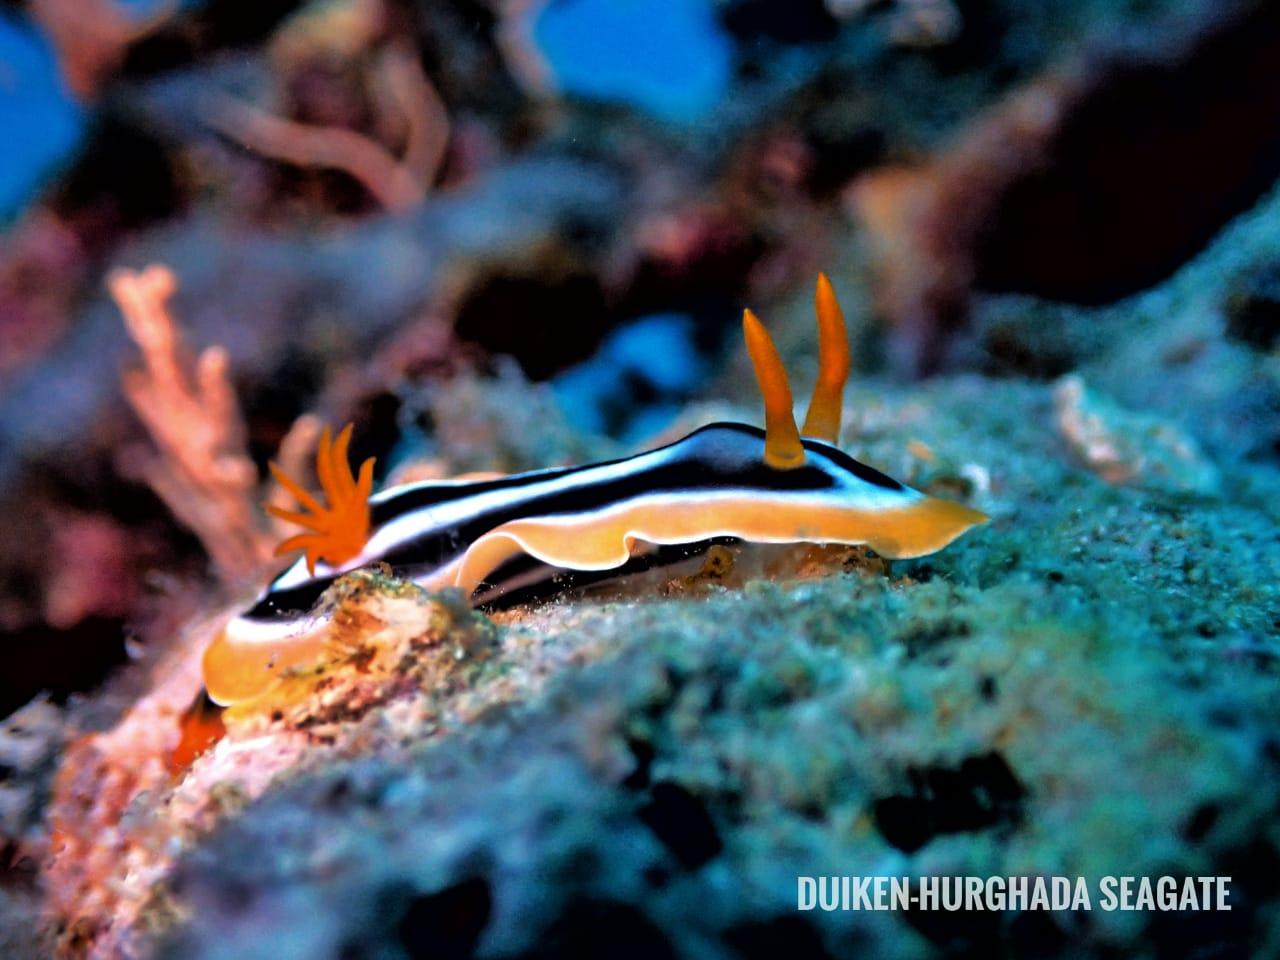 Nudibranch, Duiken Hurghada Seagate